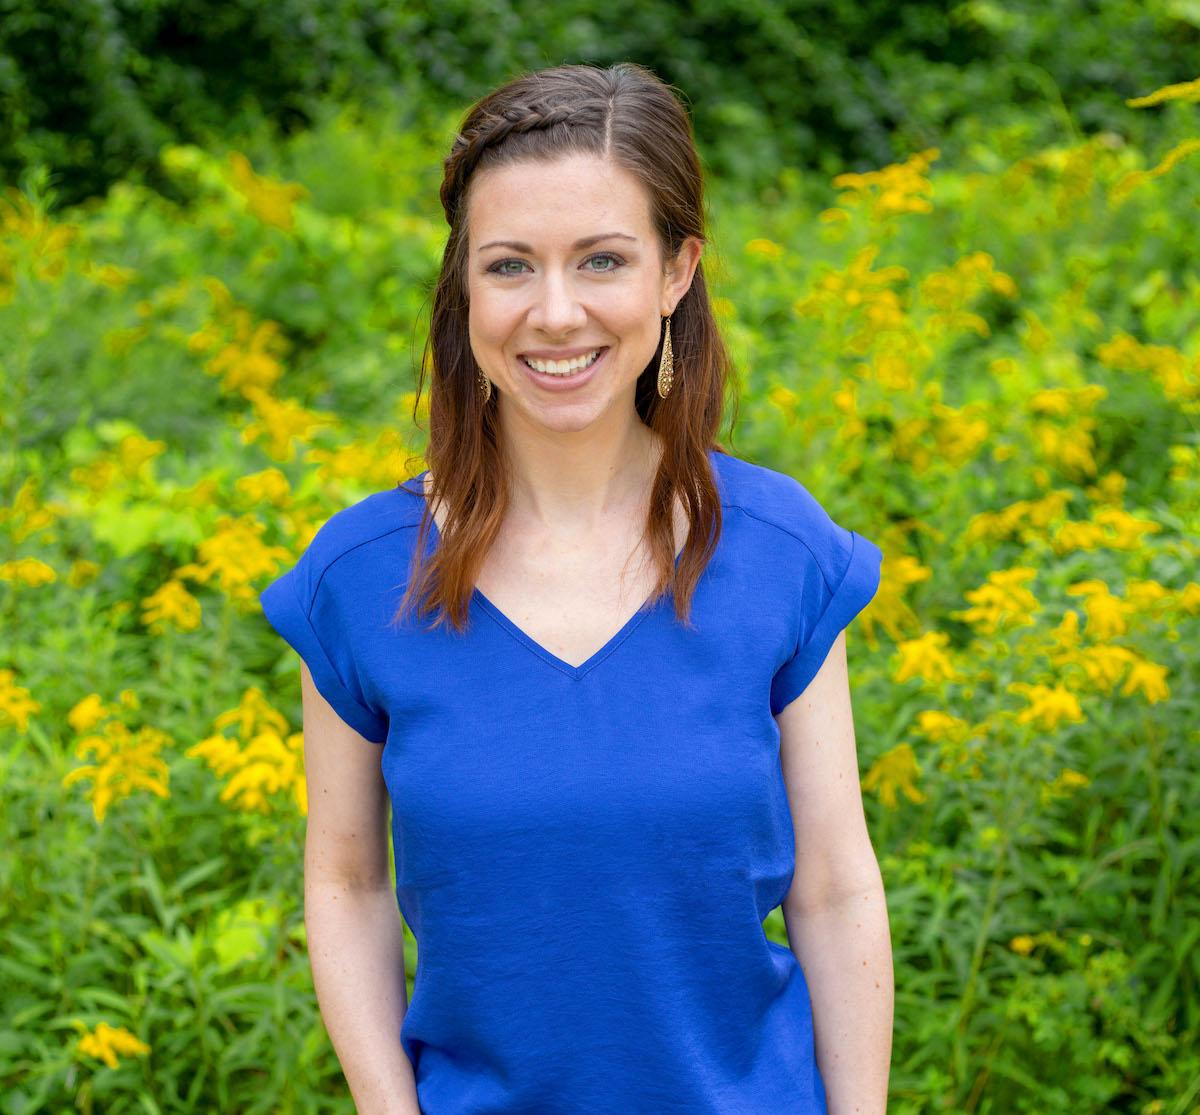 Chef Lauren D'Agostino